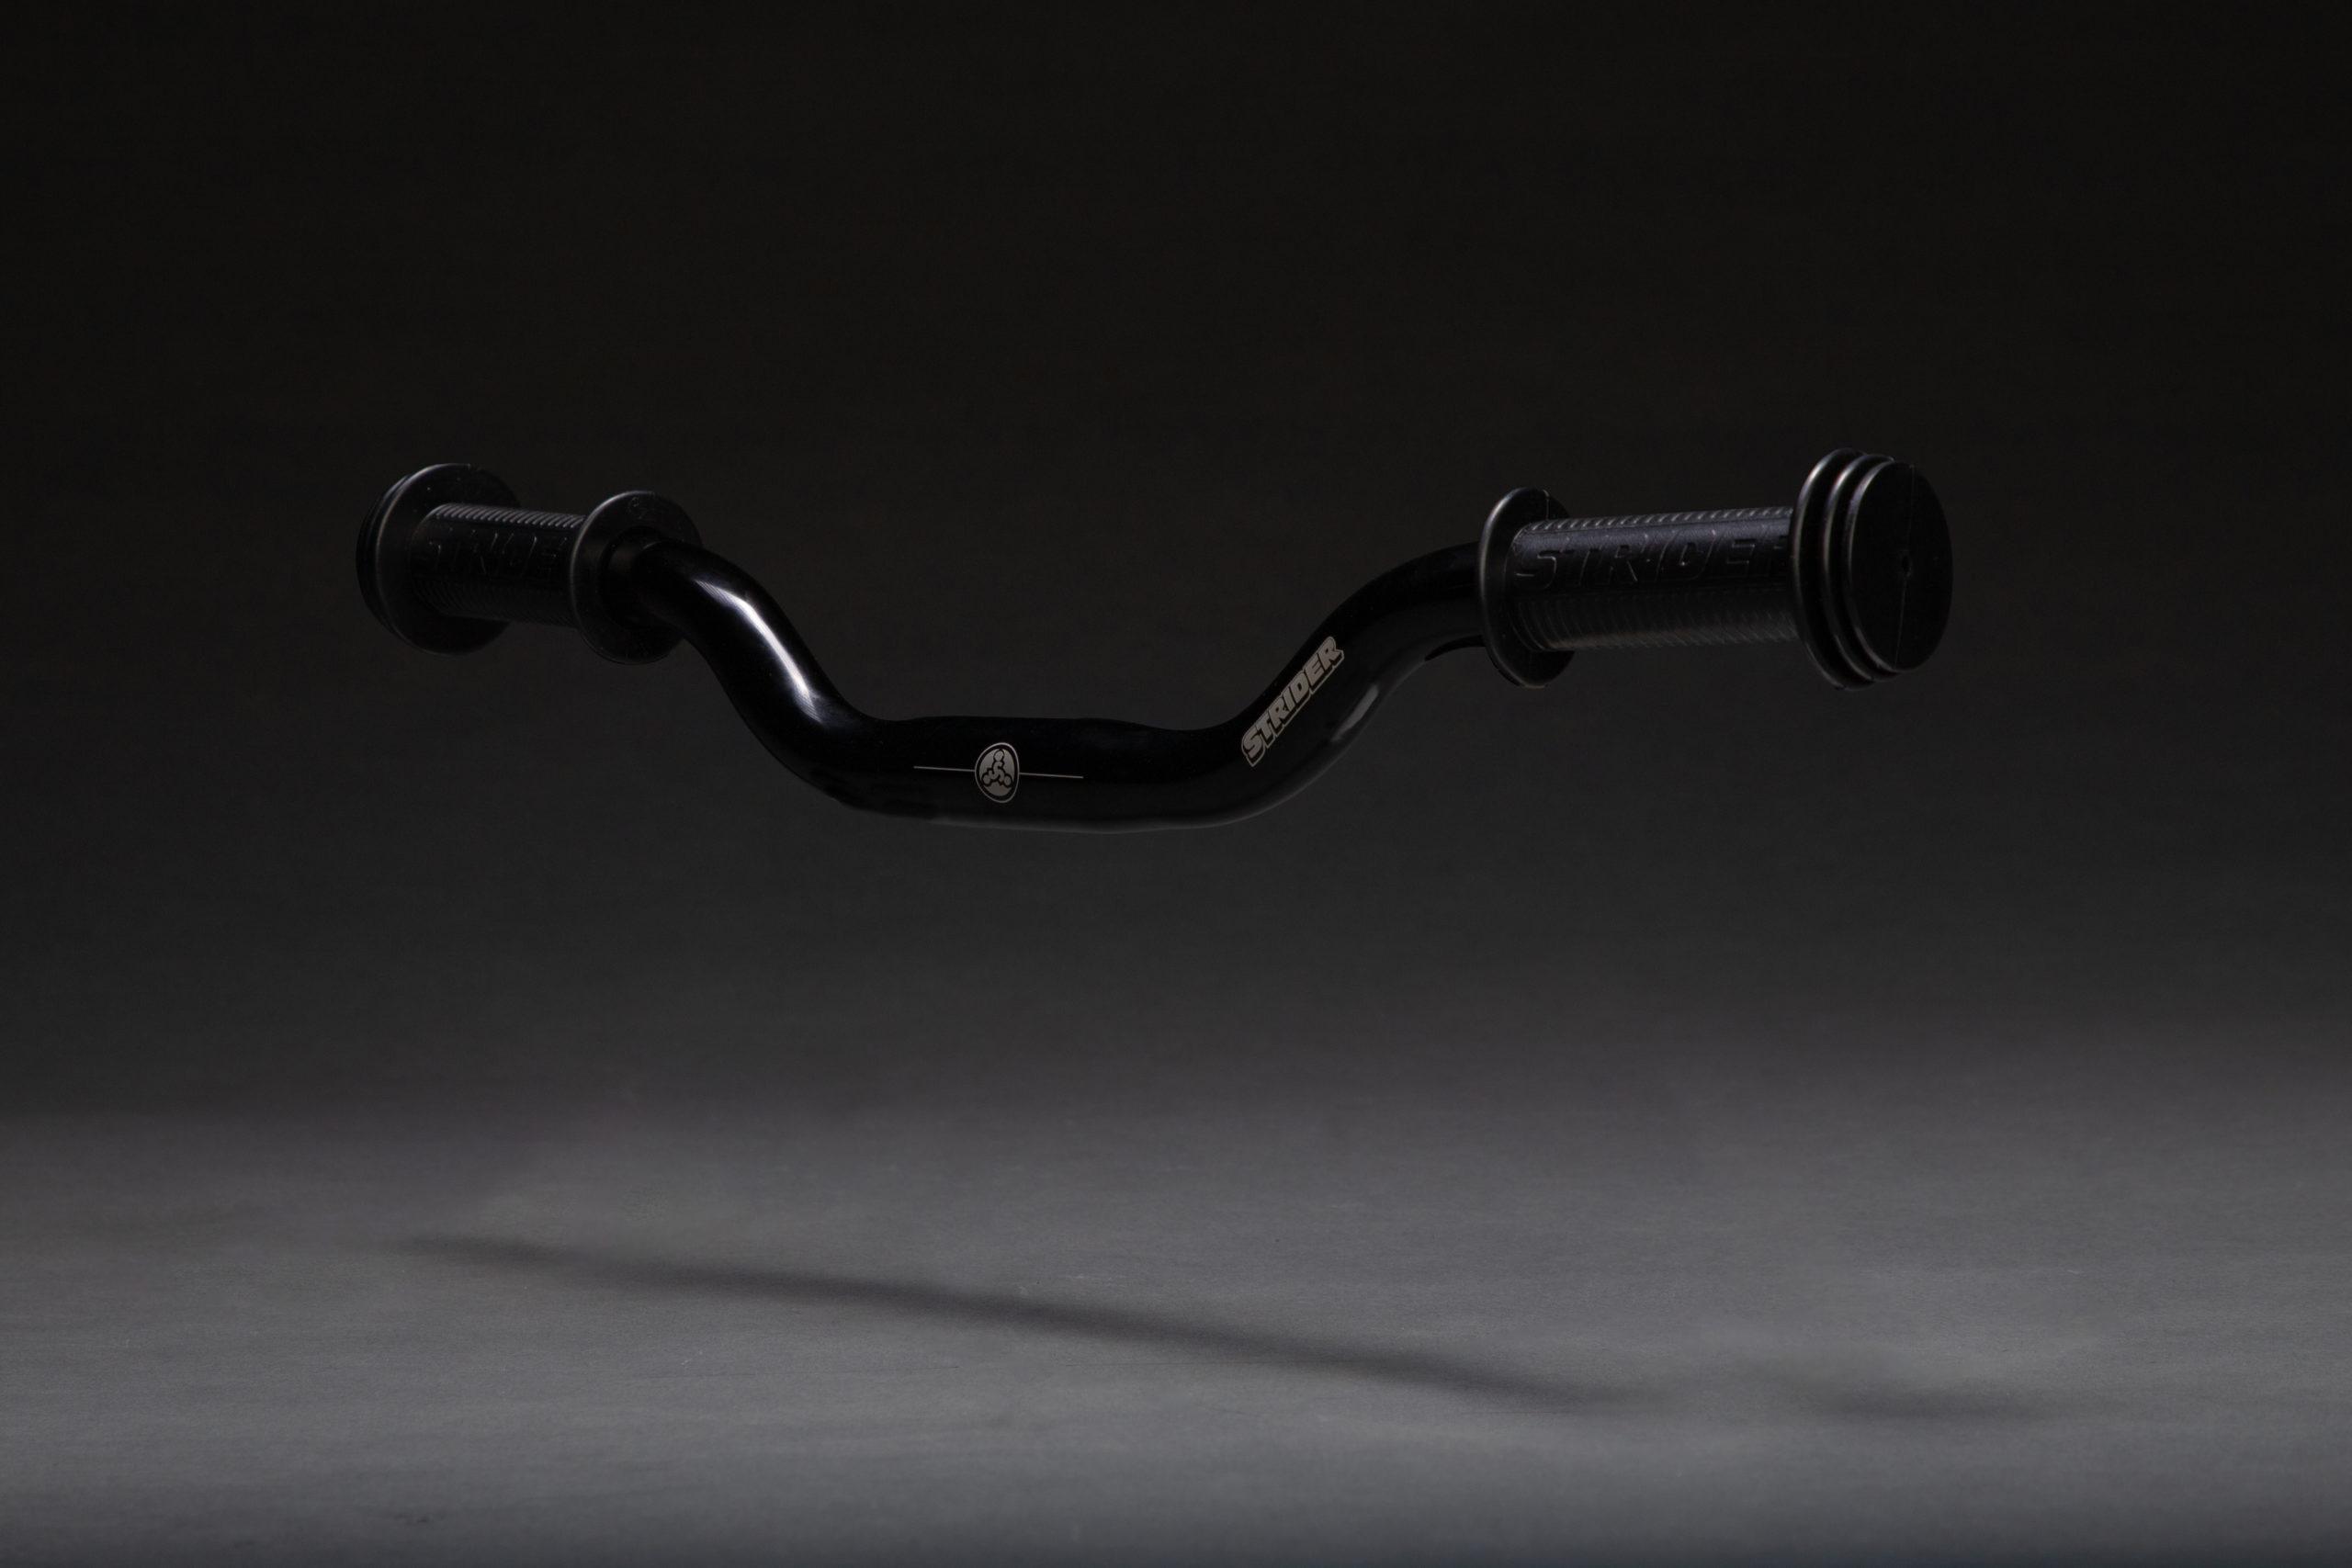 Dark studio image of Strider Aluminum Riser Handlebars with Grips